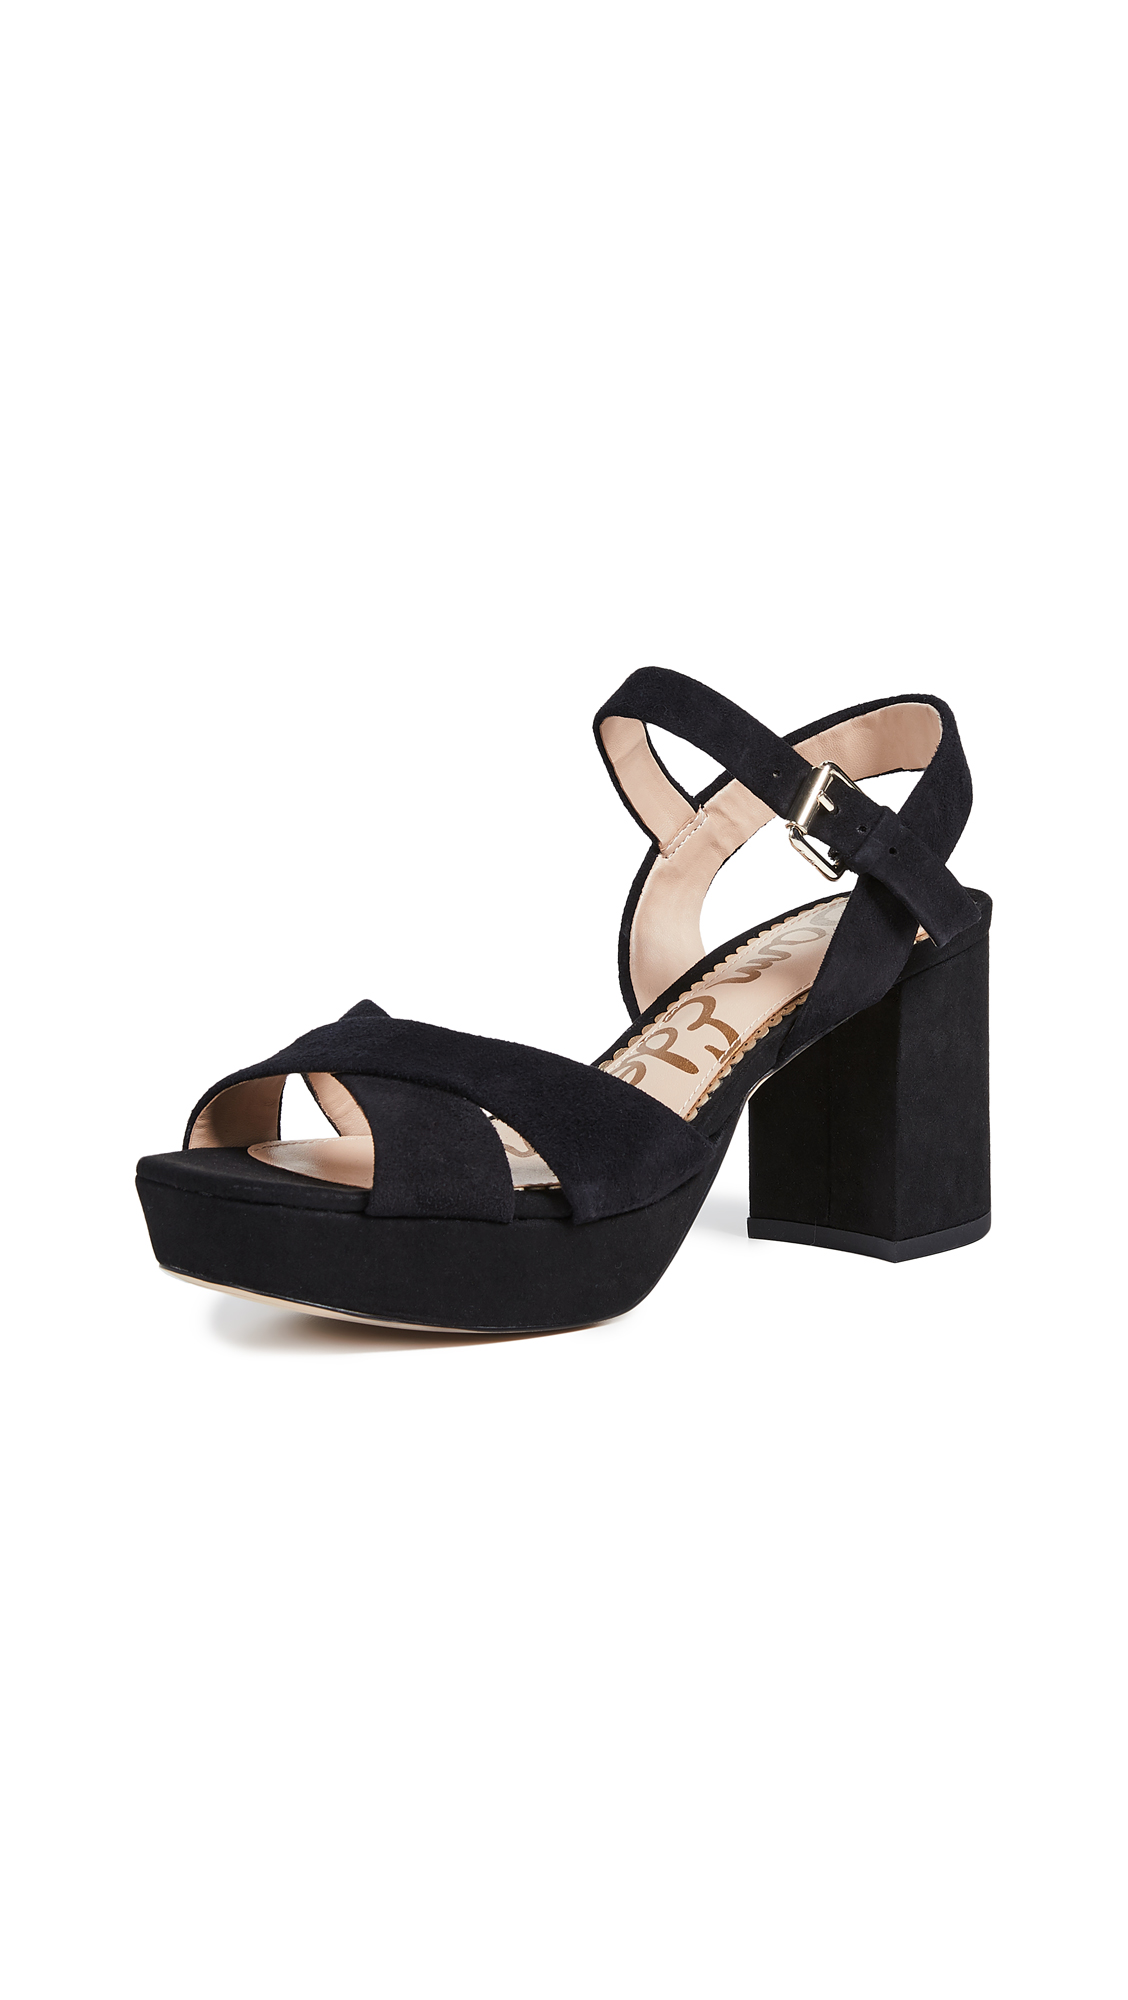 Sam Edelman Jolene Platform Sandals - Black